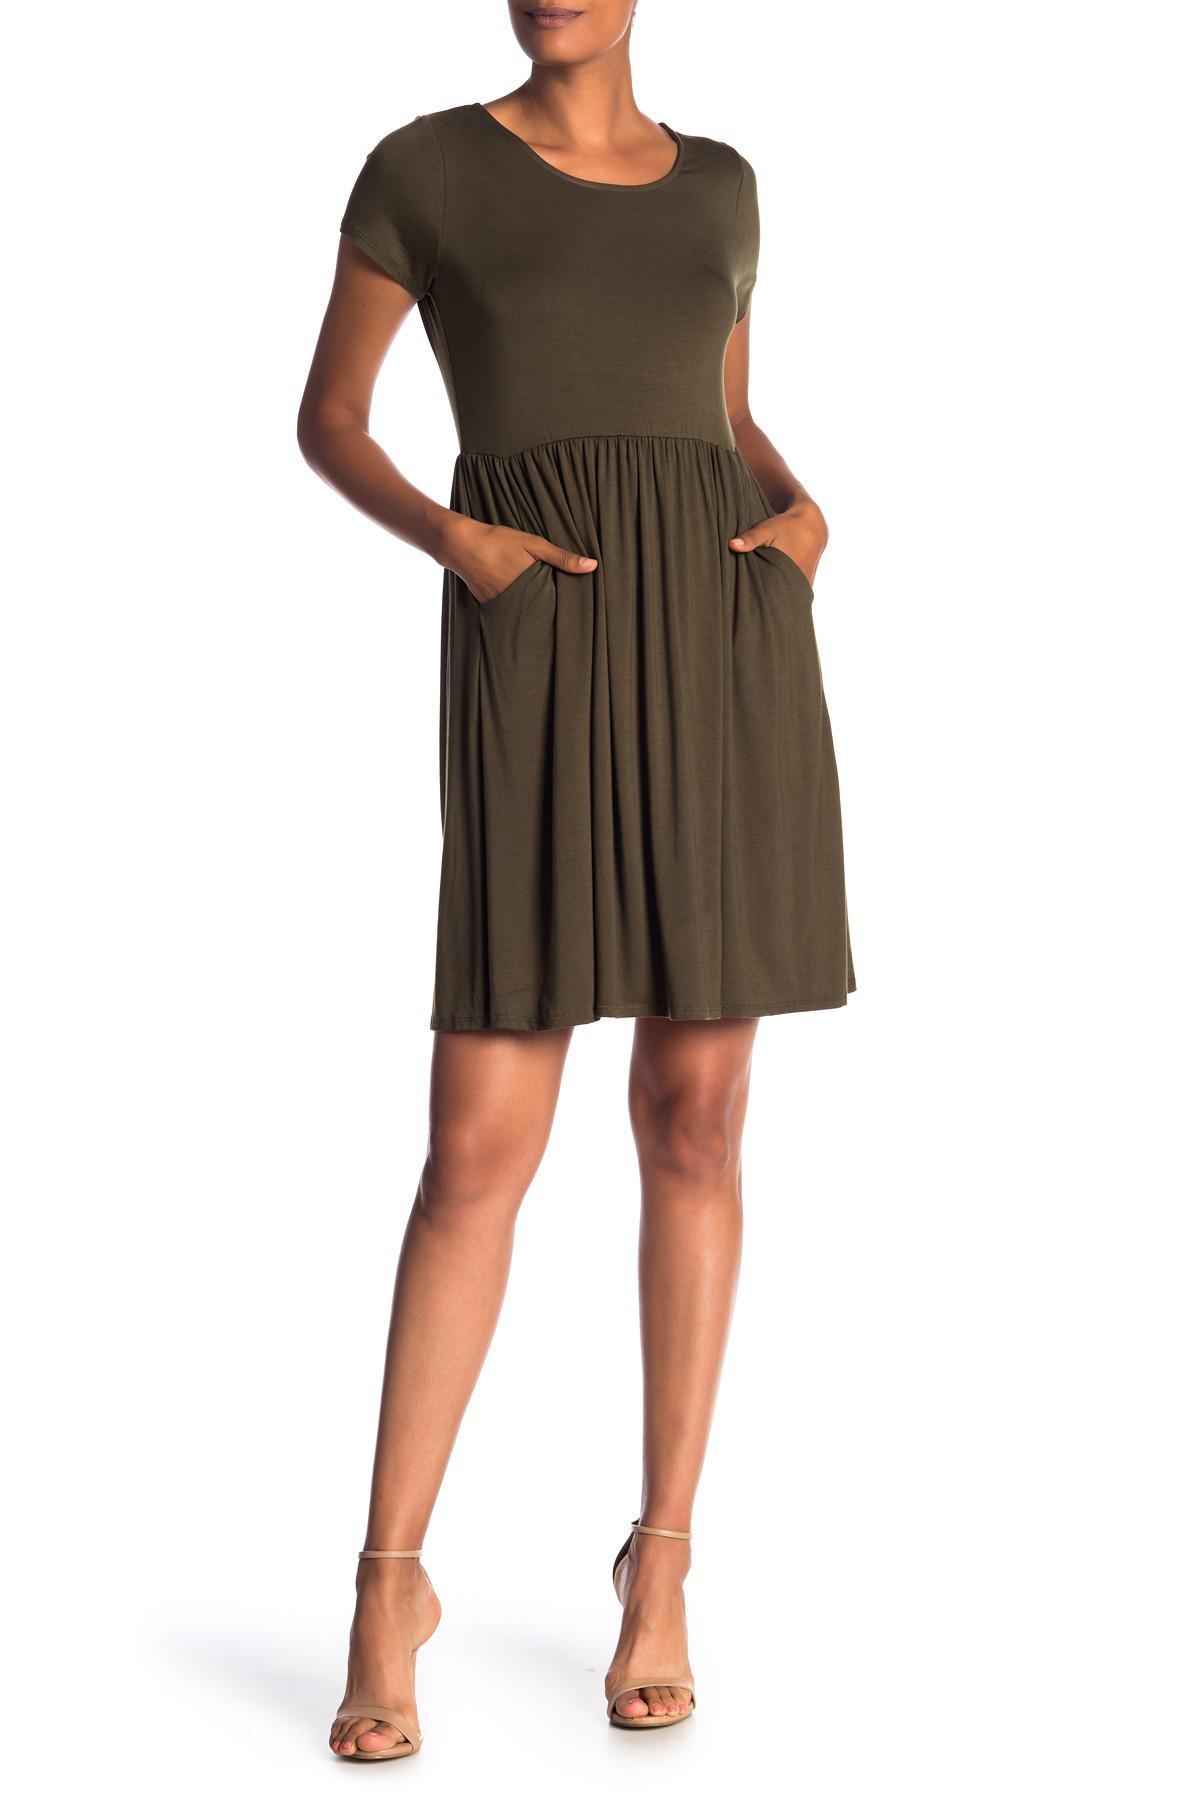 0359b3da04f Lyst - West Kei Short Sleeve Knit Dress in Green